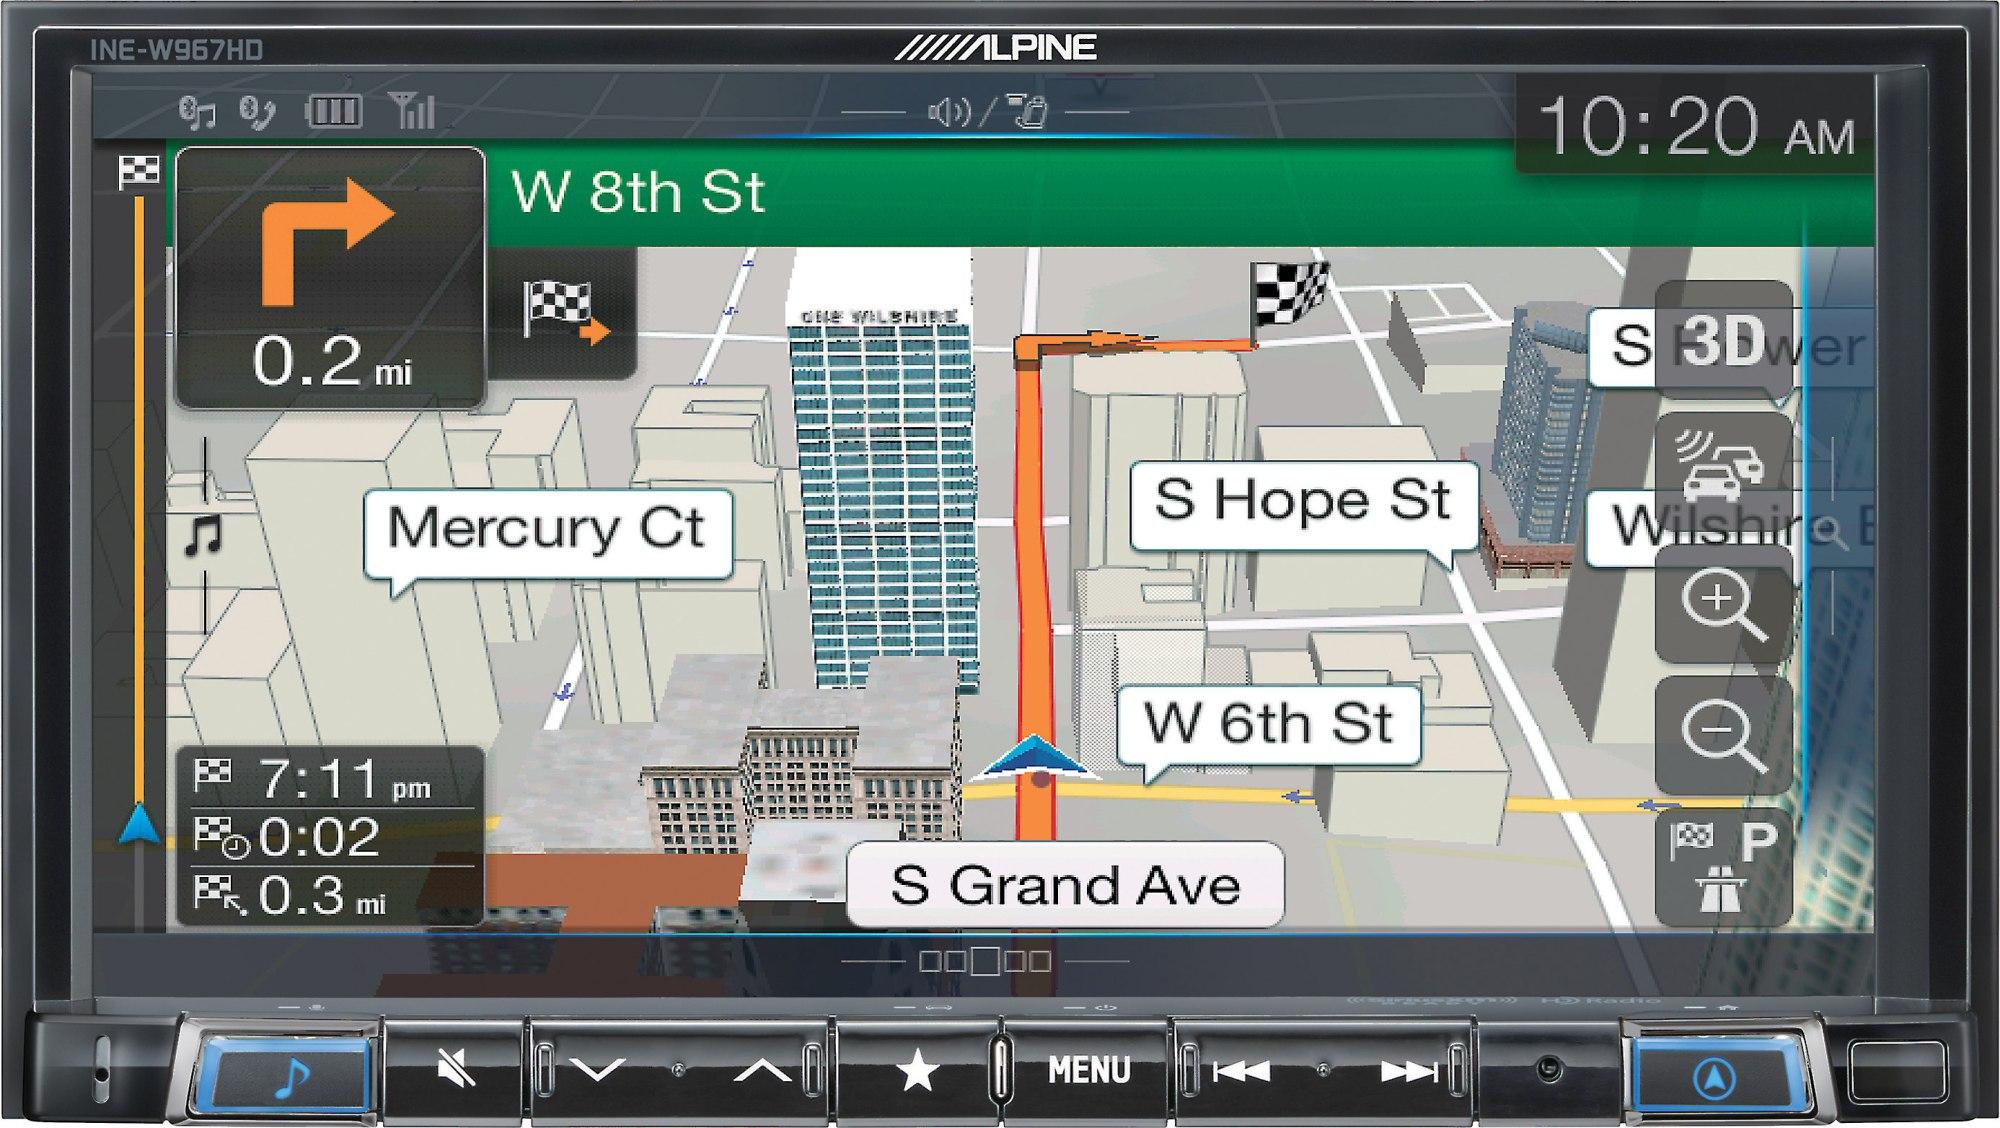 hight resolution of  alpine ine w967hd digital media navigation receiver does not play on alpine car alarm alpine navigation wiring diagram